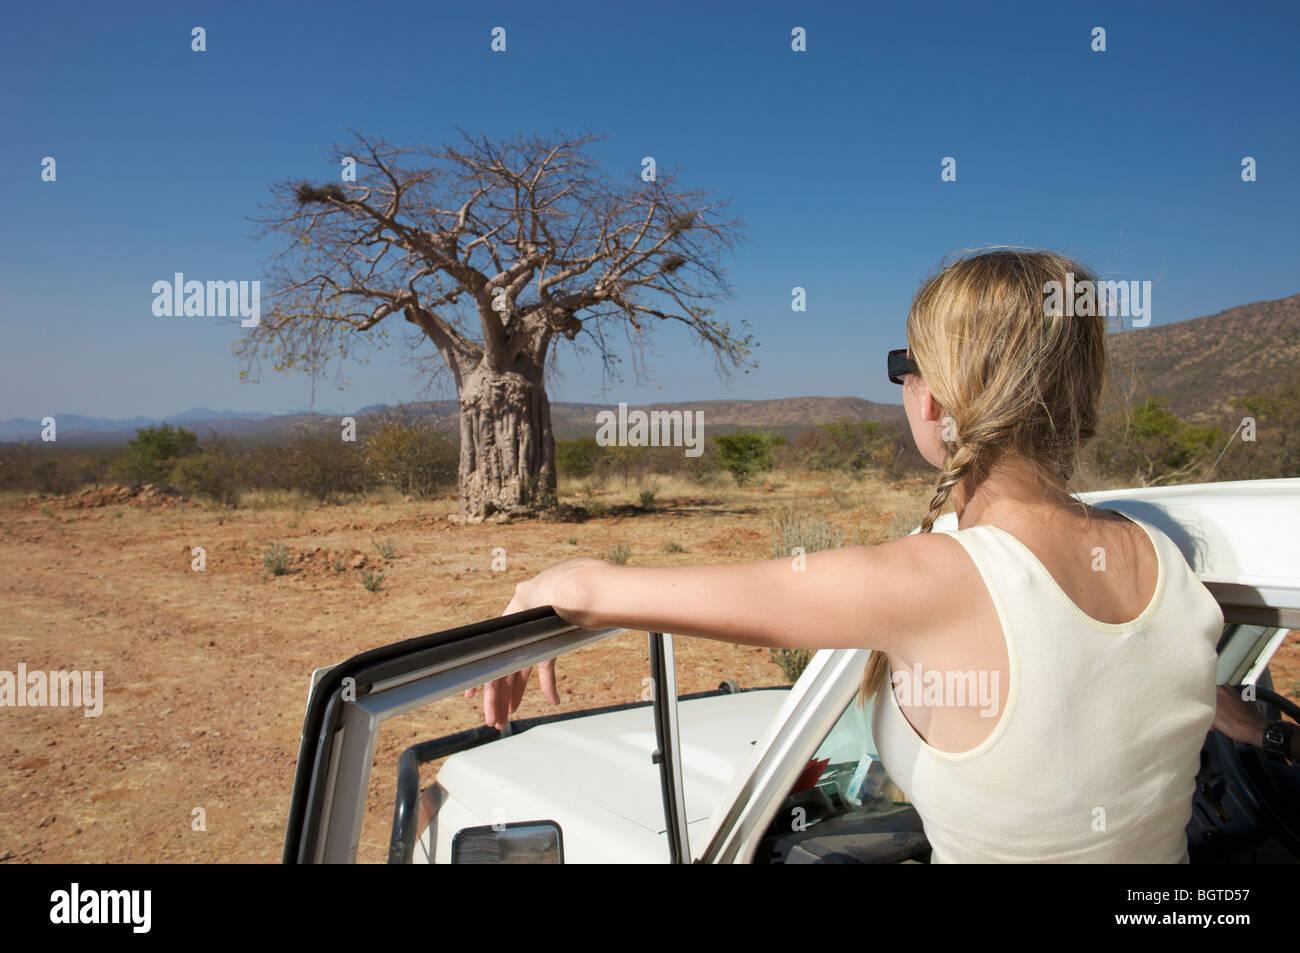 Giovane donna accanto al veicolo a motore guardando Baobab, Epupa Falls area, Kaokoland, Namibia Foto Stock